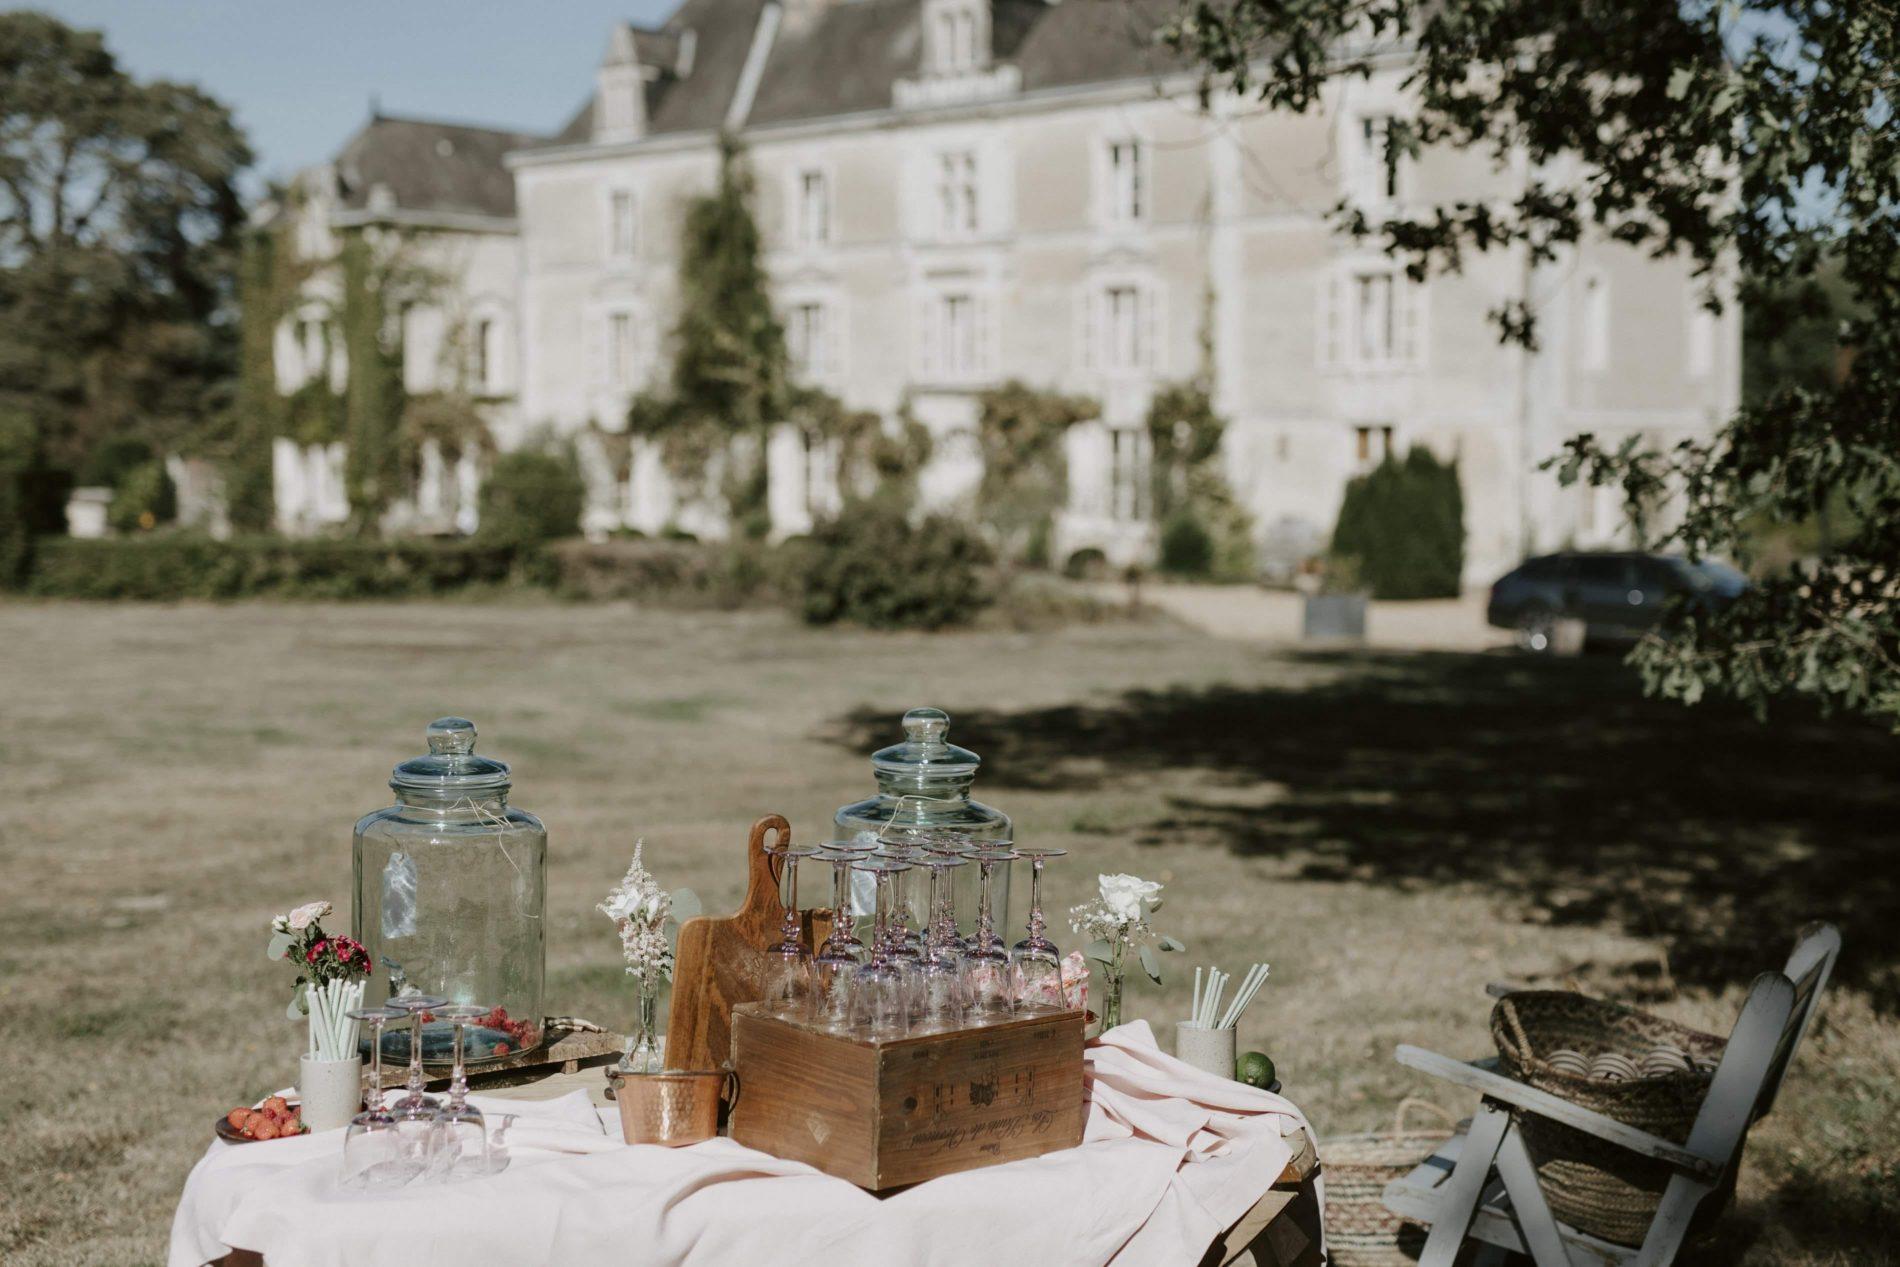 03-CelineSereivuth-14-obonheurdesdames-decoration-mariage-location-Jordane-Chaillou